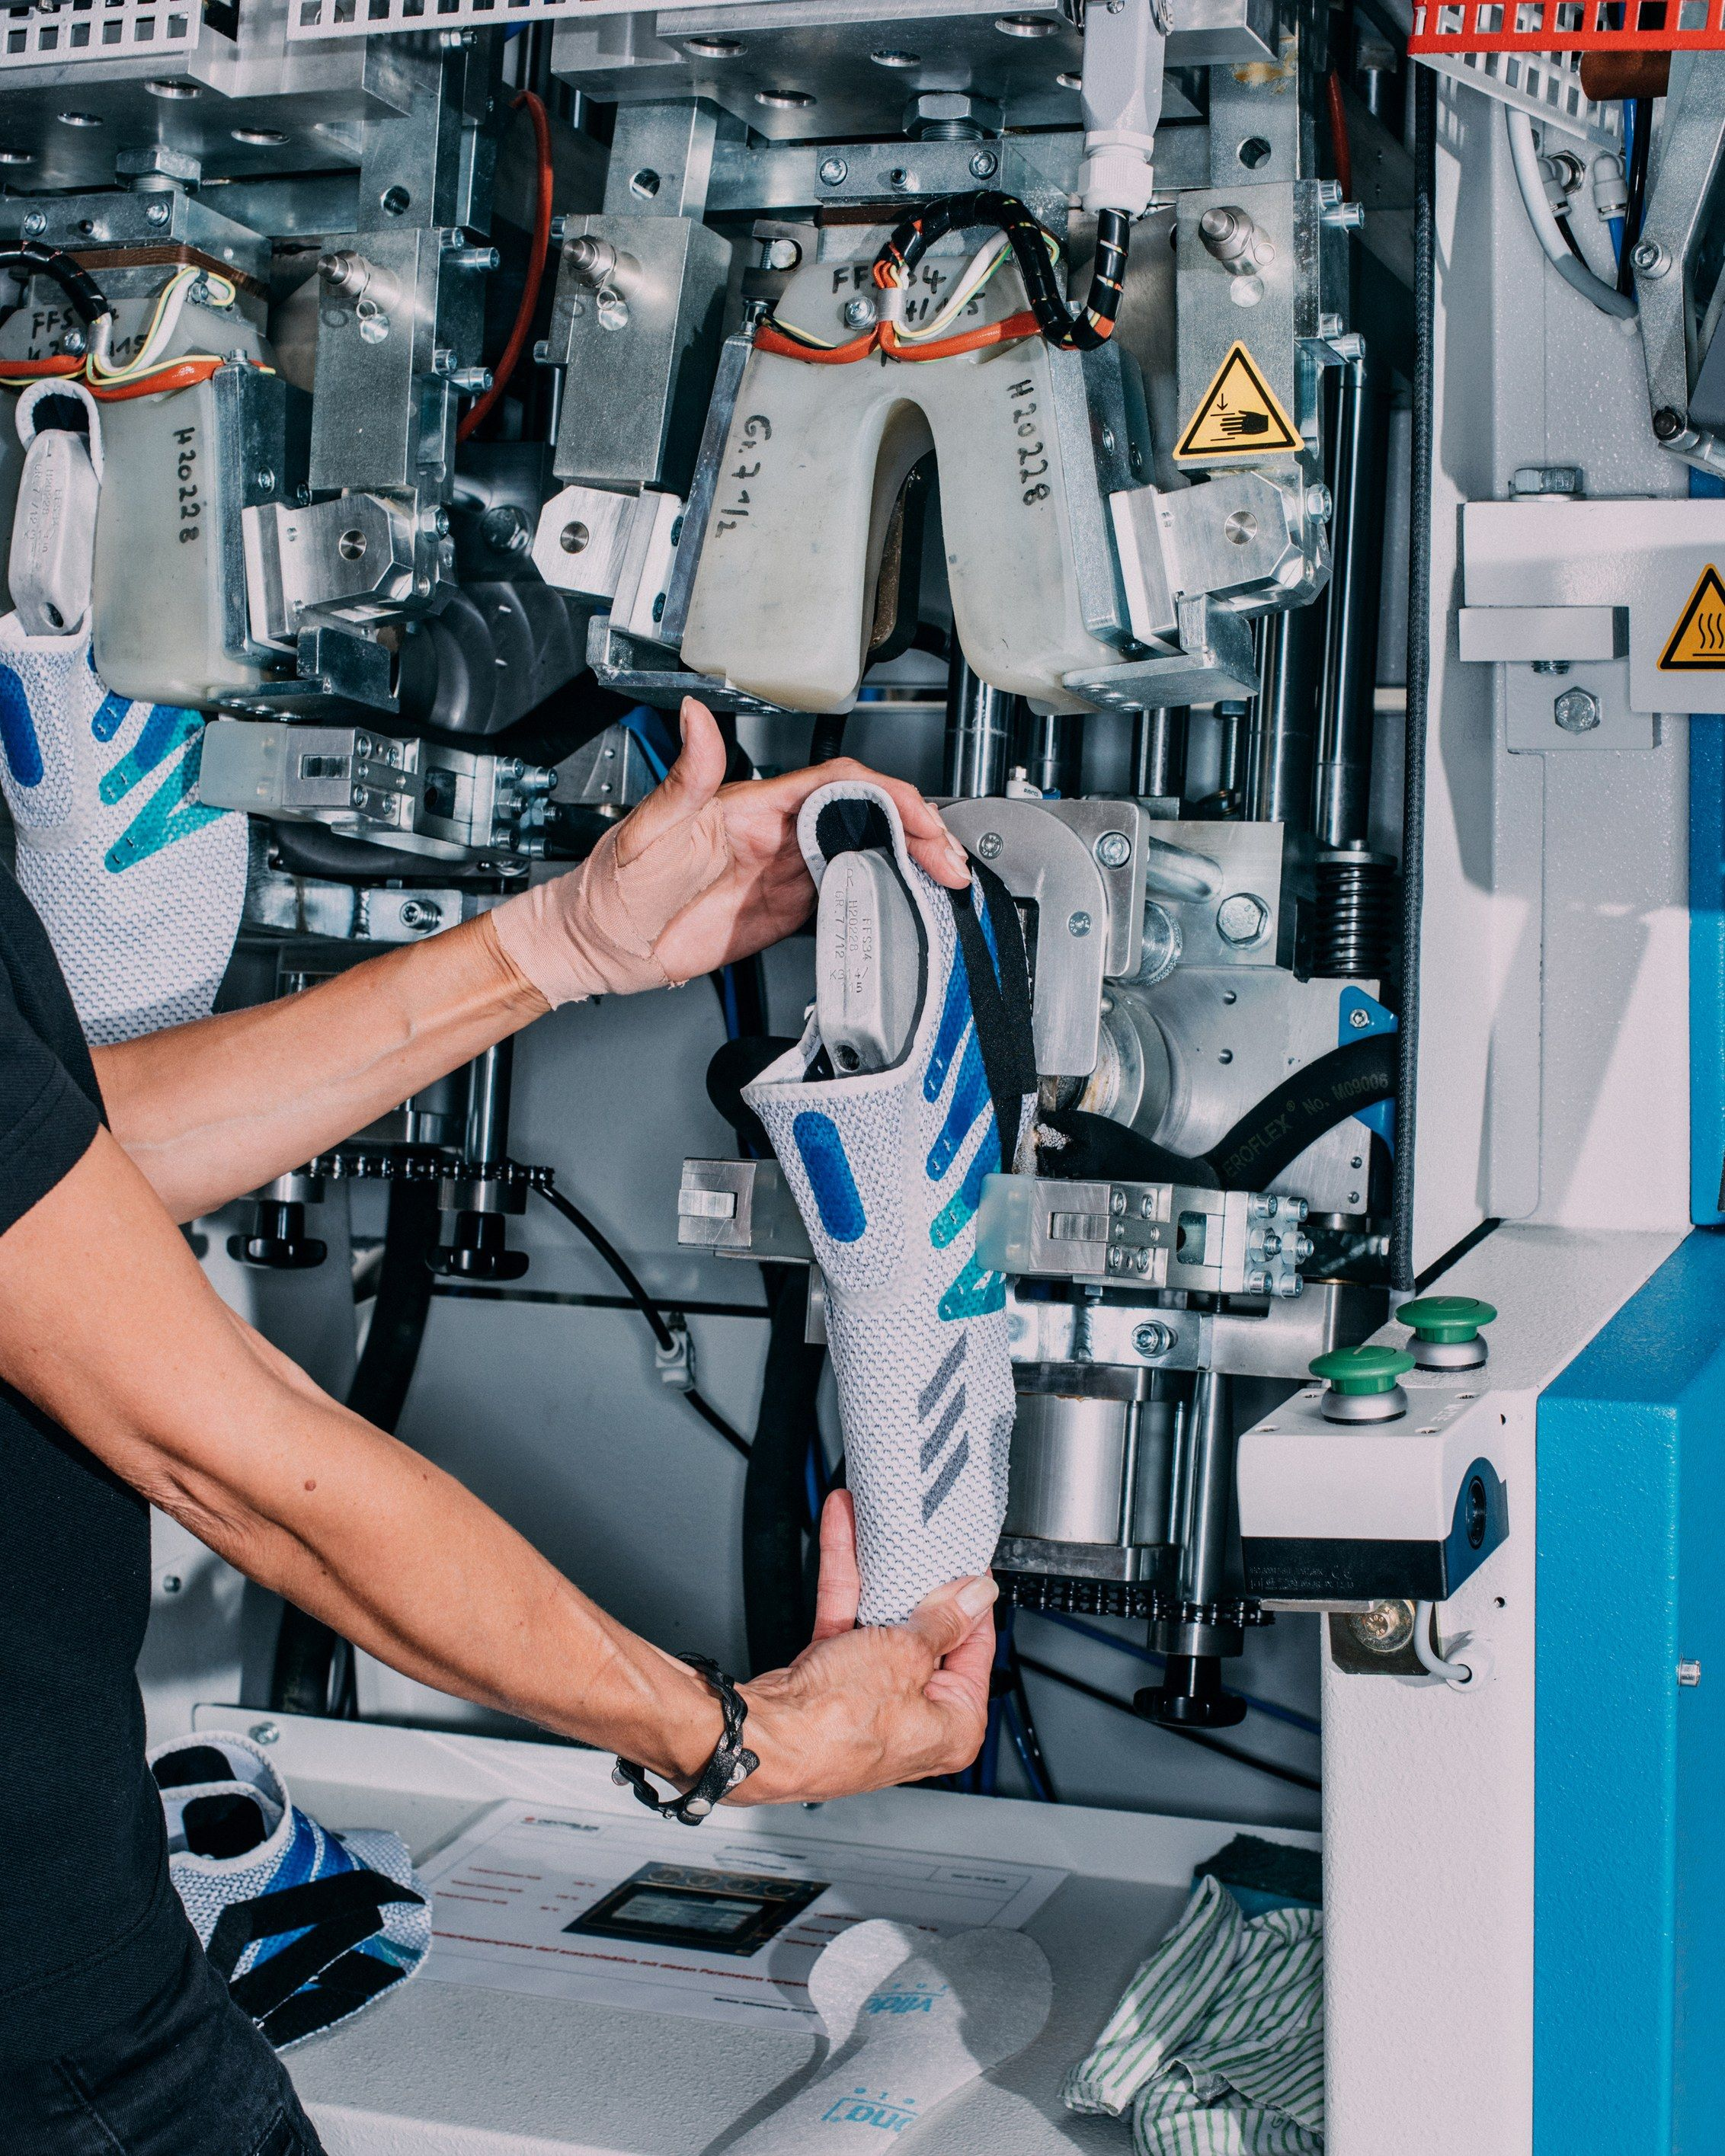 Intento Boquilla llevar a cabo  Inside Adidas' Robot-Powered, On-Demand Sneaker Factory | Factory, Sci fi  armor, Robot